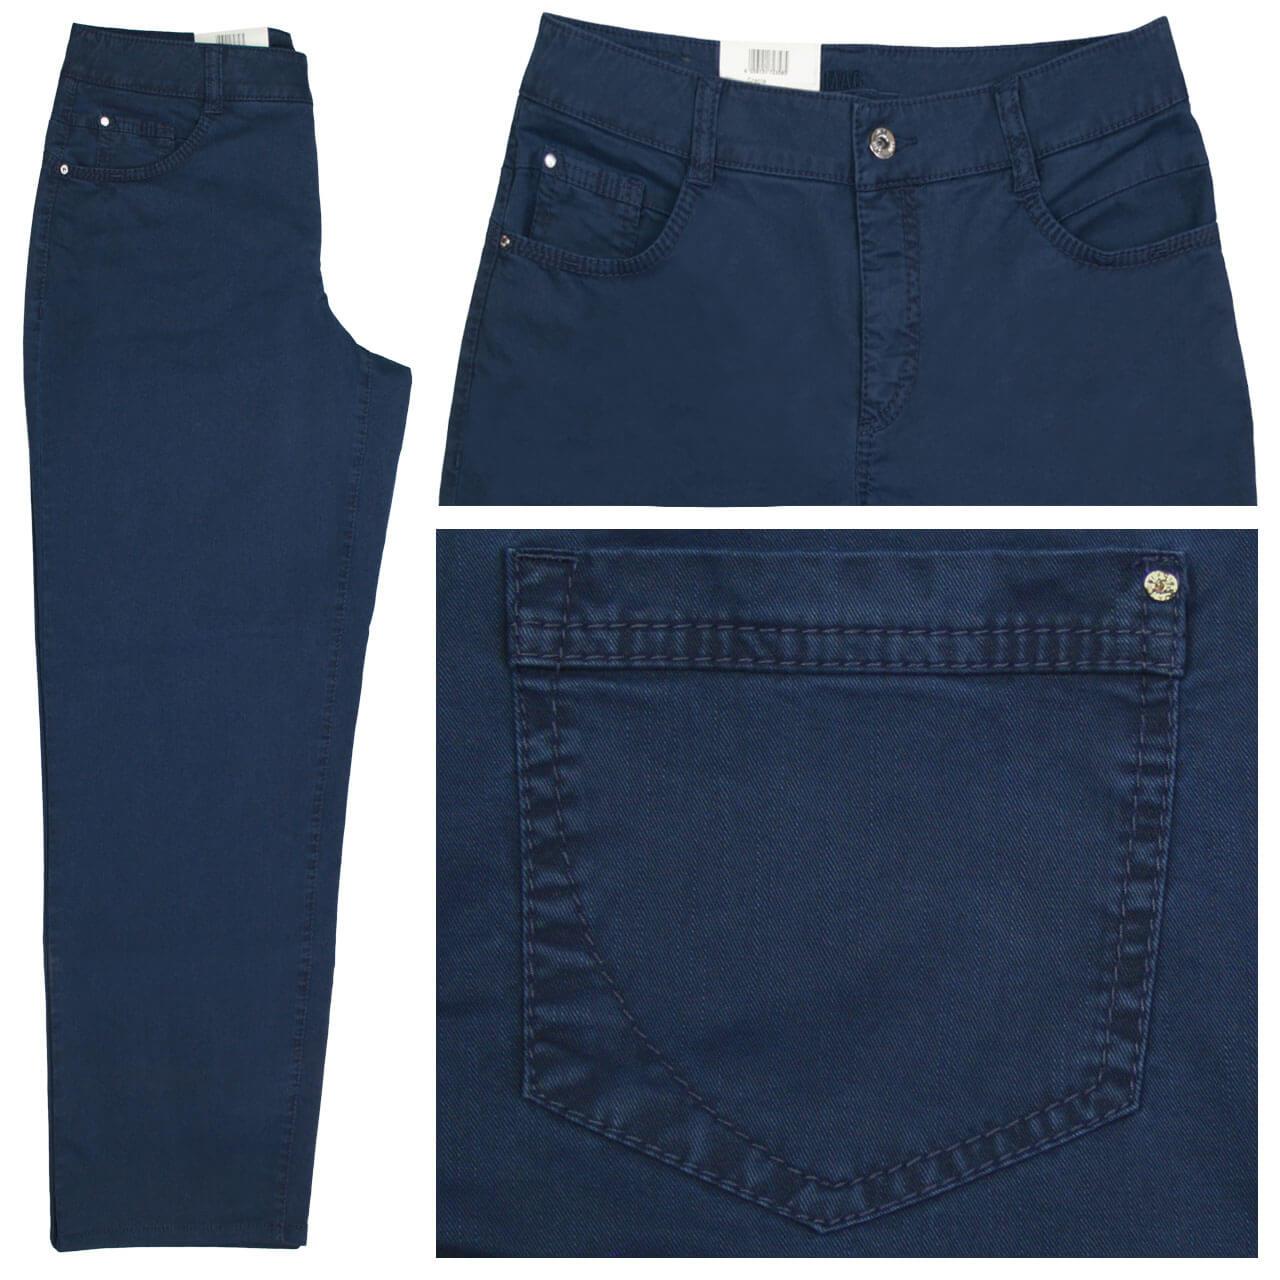 MAC Jeans Gracia doveblue